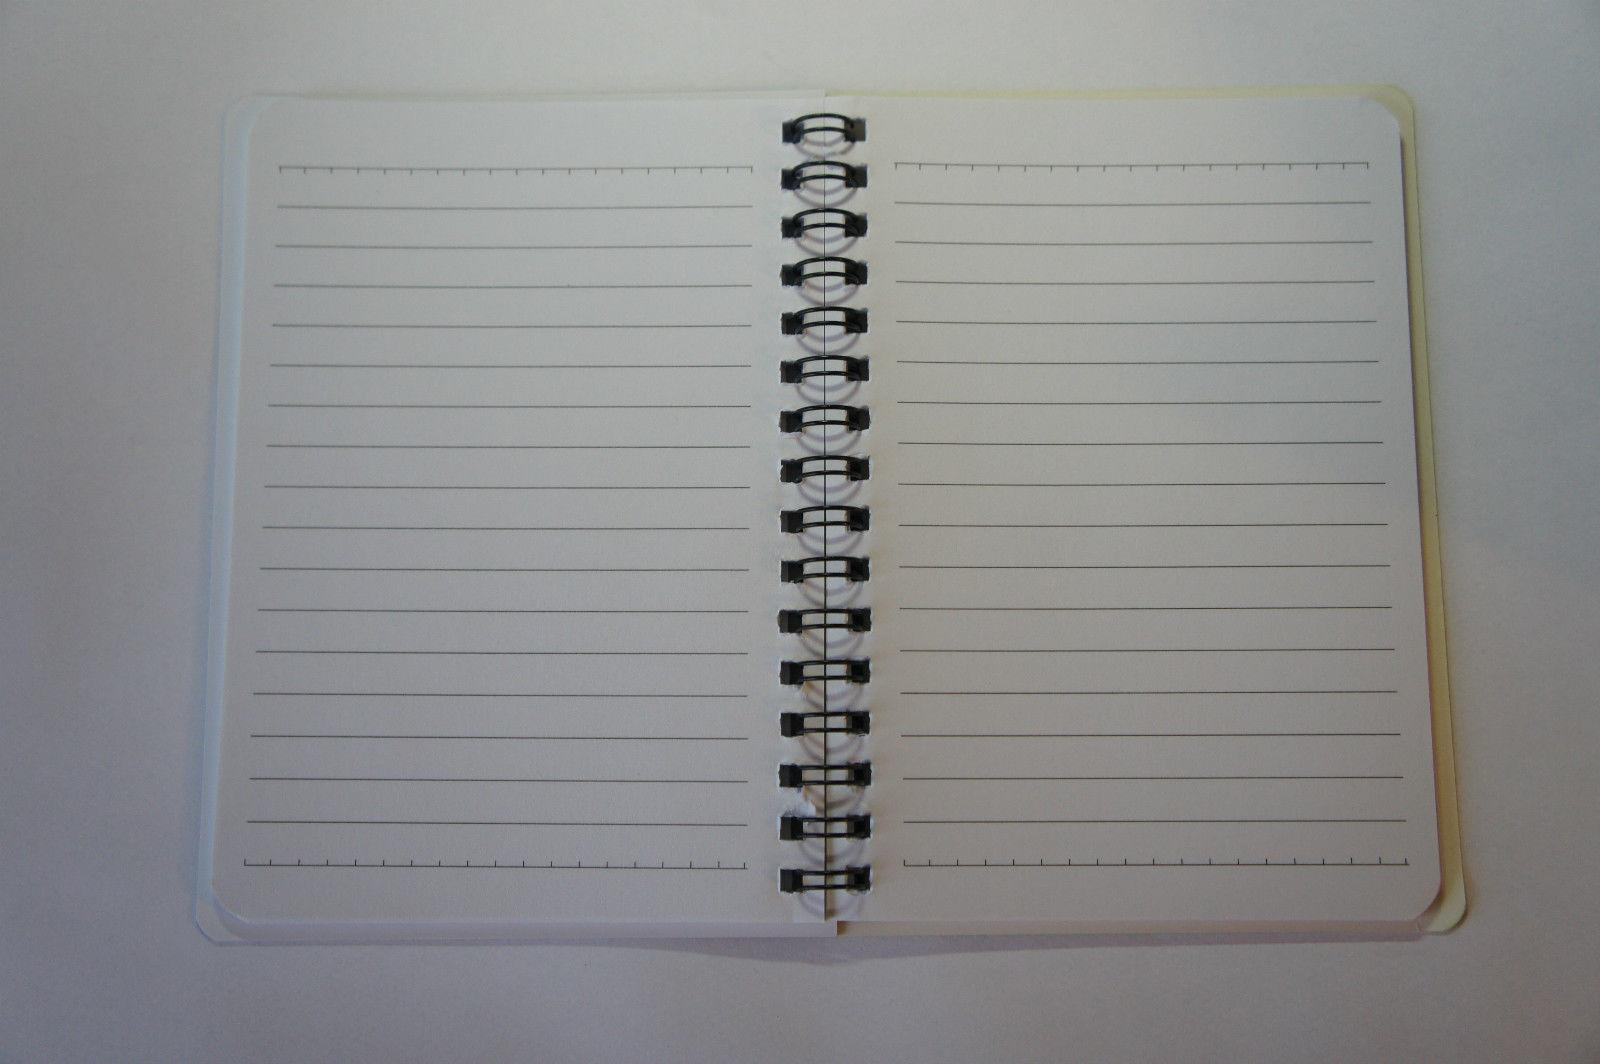 Barn Owl 3D Notebook image 2